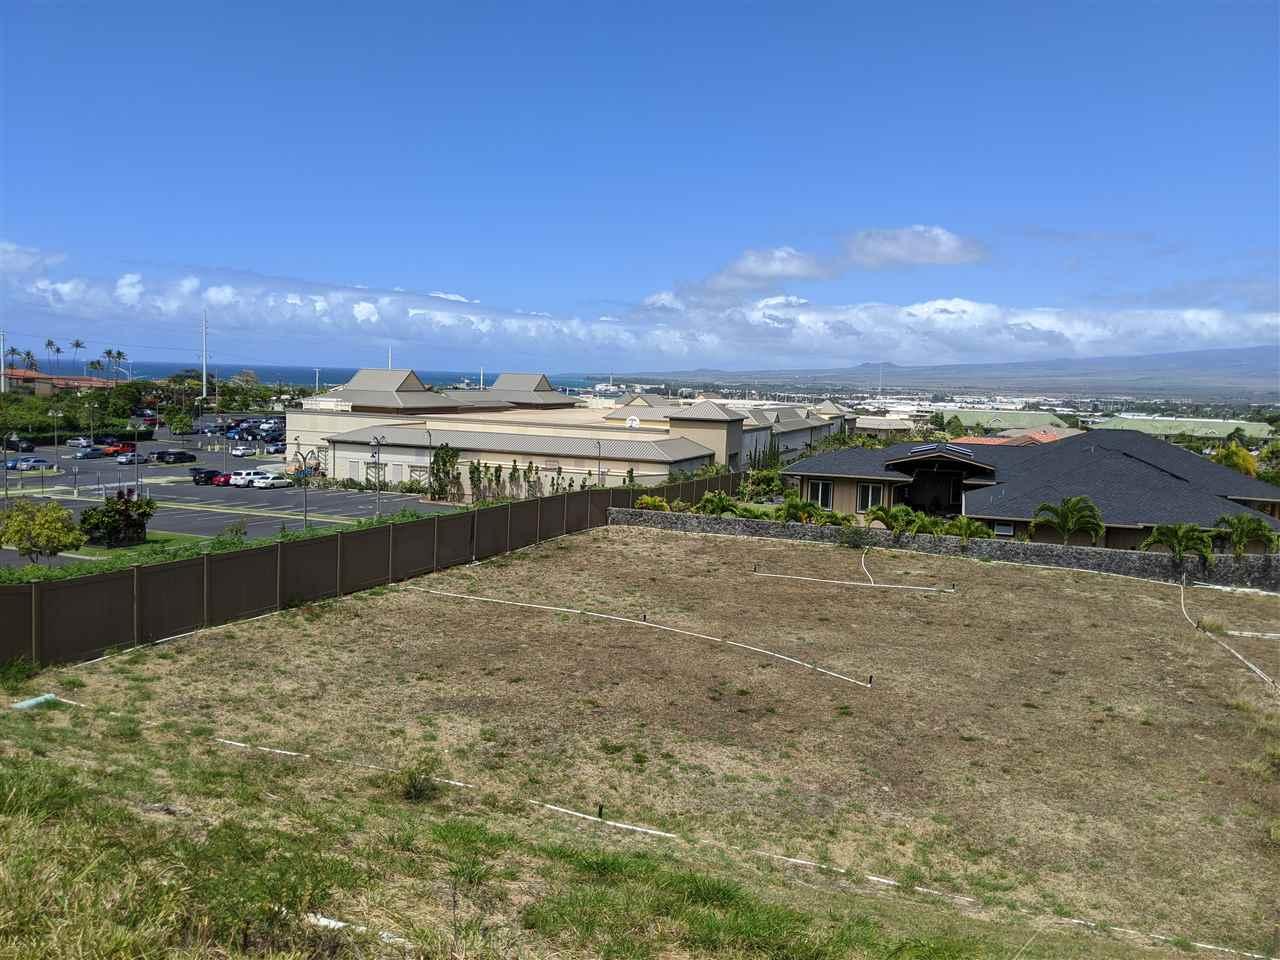 68 Keoneloa St  Wailuku, Hi 96793 vacant land - photo 5 of 15